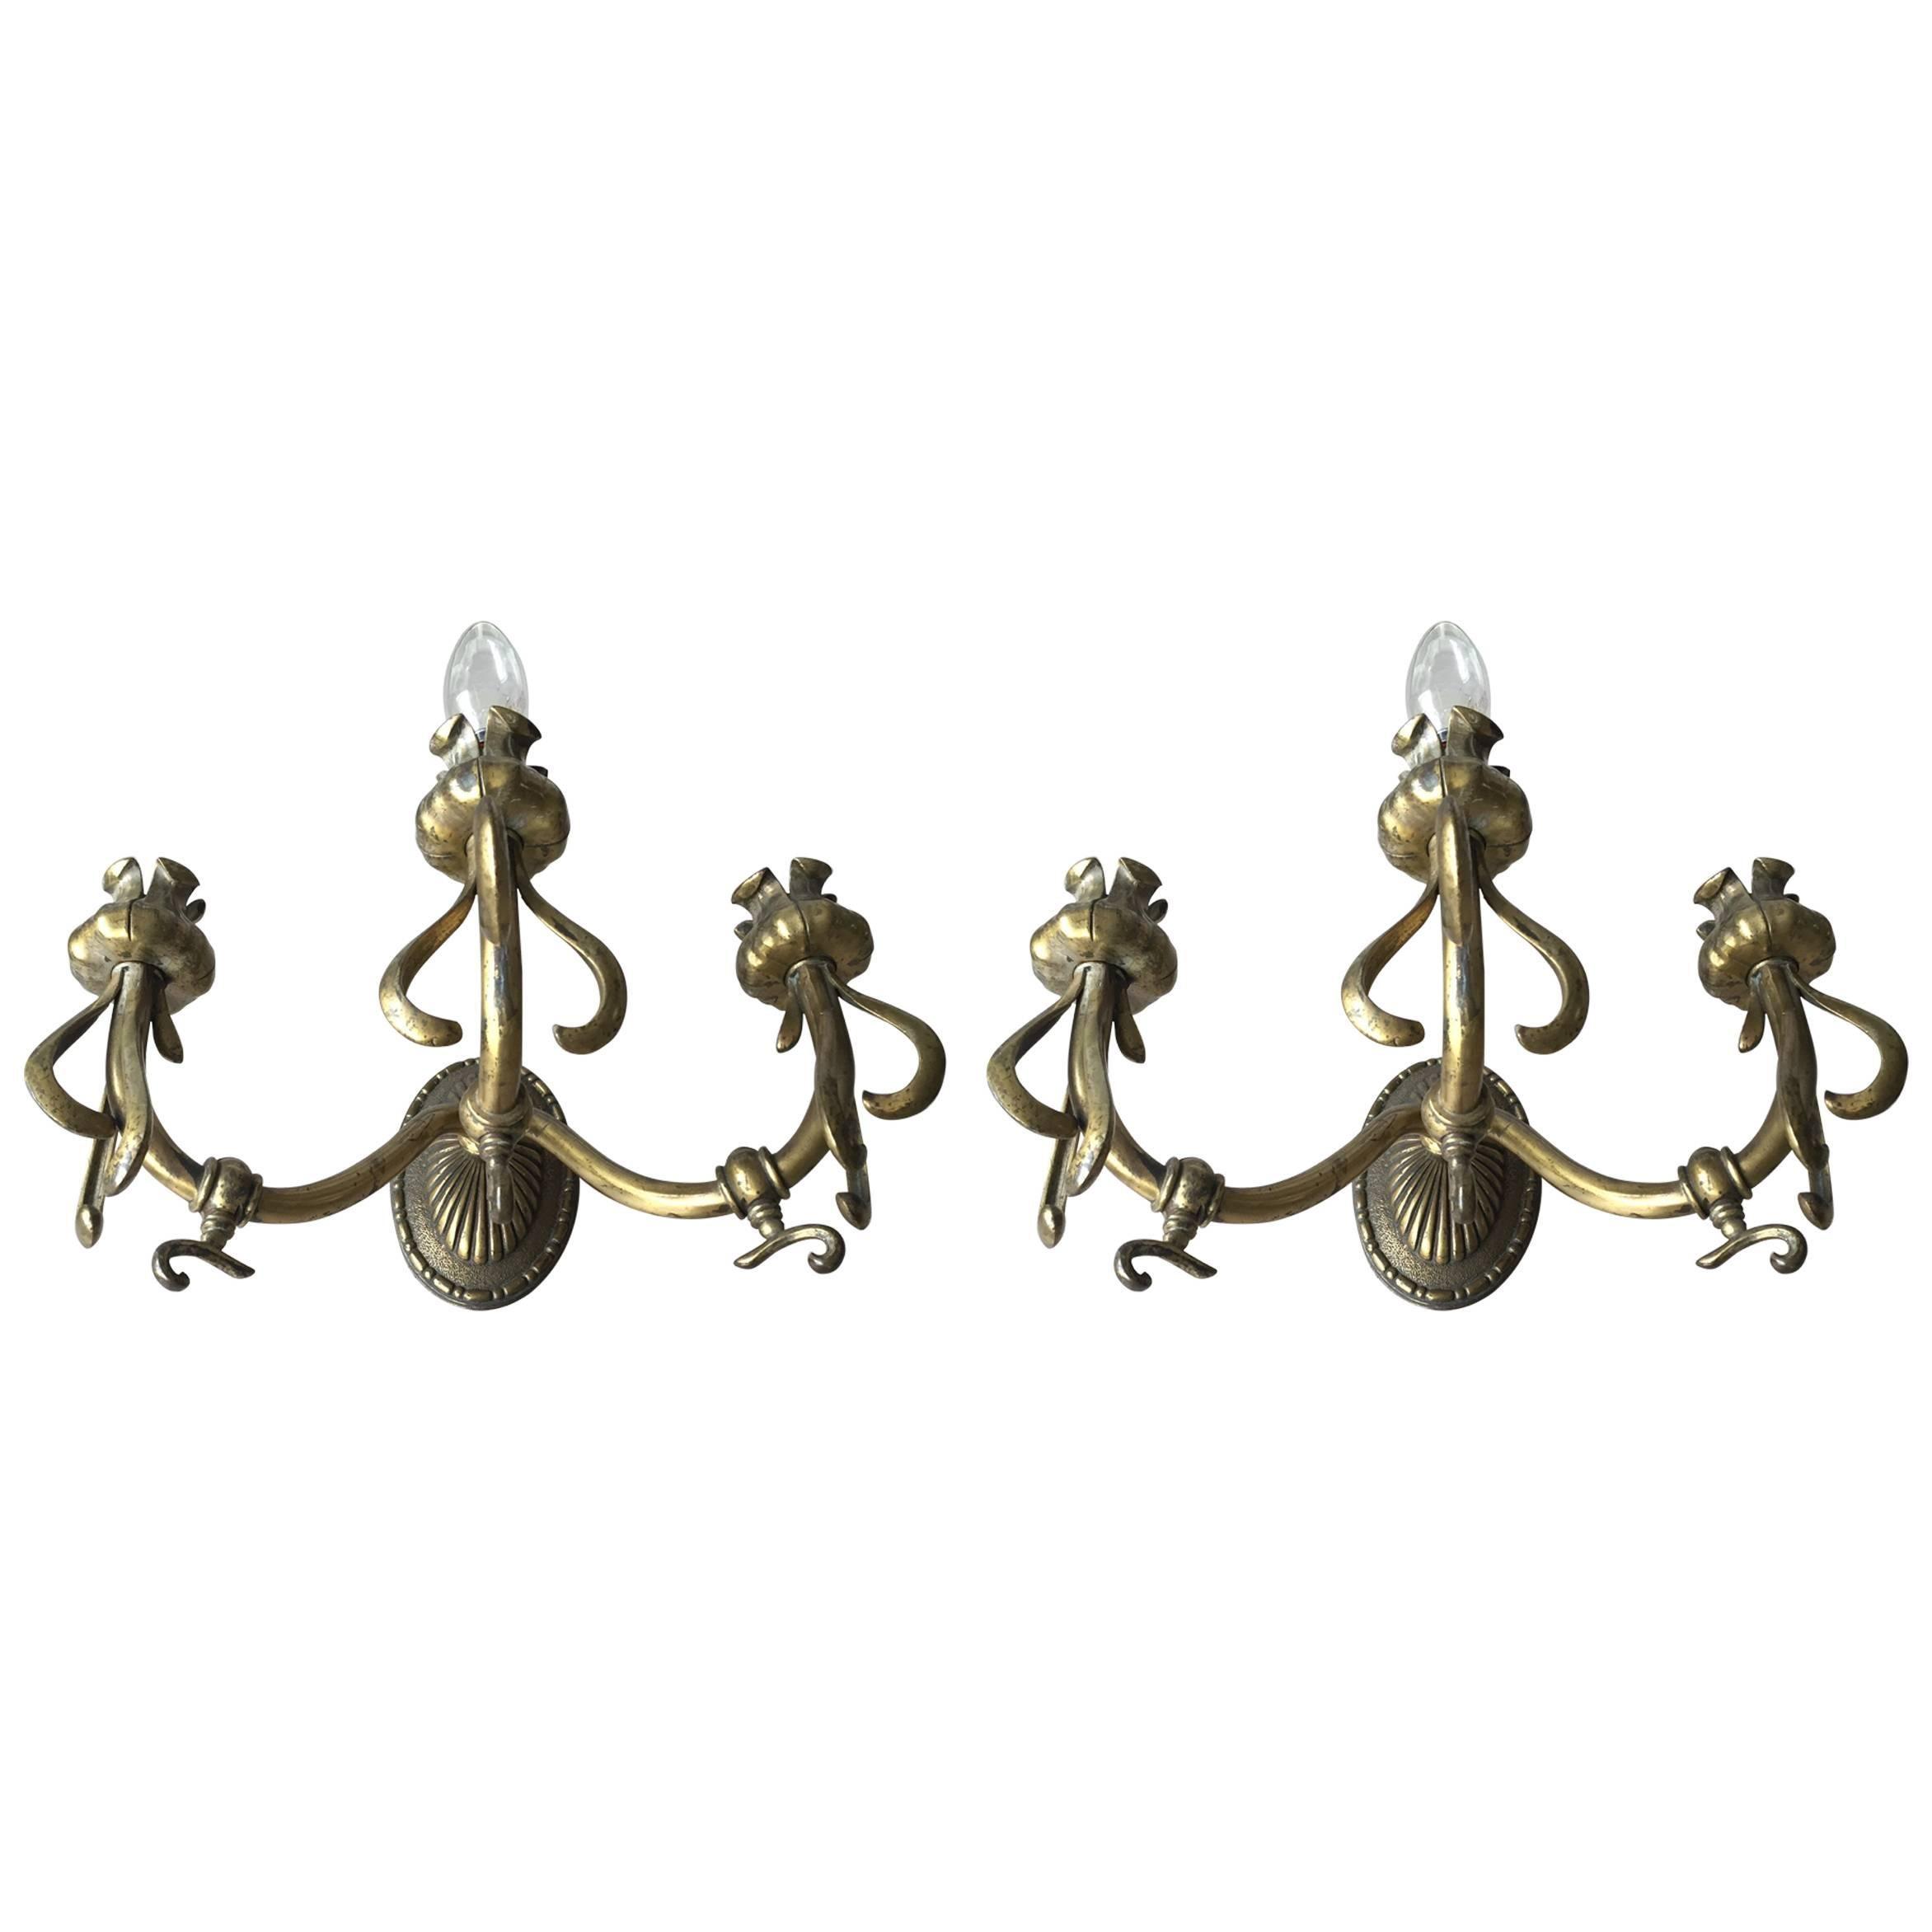 Rare Pair of Art Nouveau Bronze Wall Sconces / Fixtures with Flower Theme